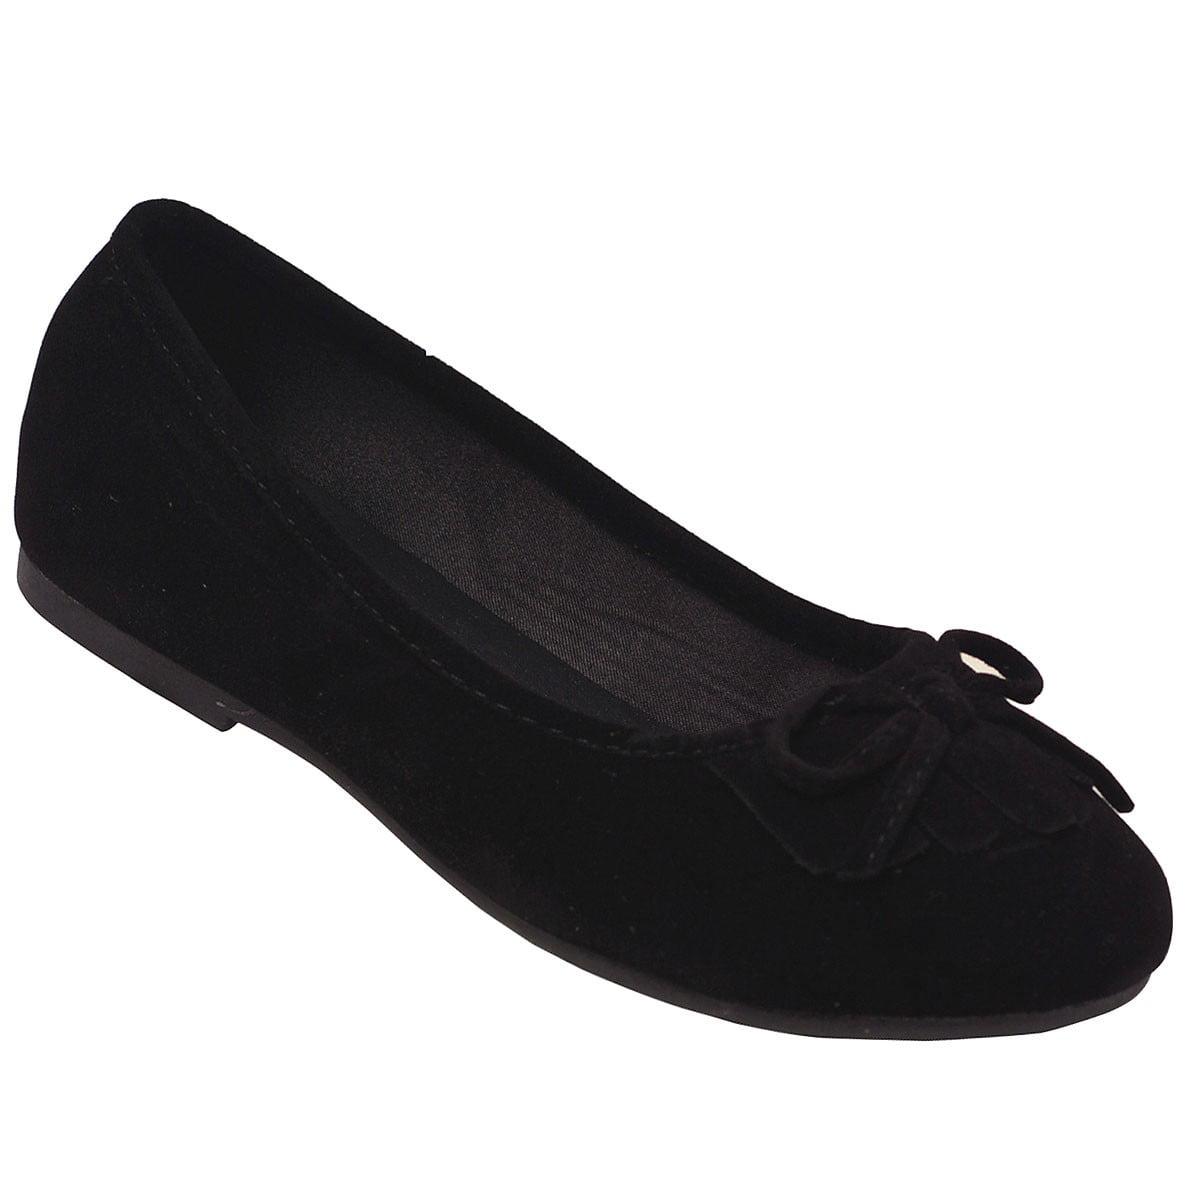 Girls Walmart Brand Jelly Ballet Flat Shoes Black Size 2 NEW